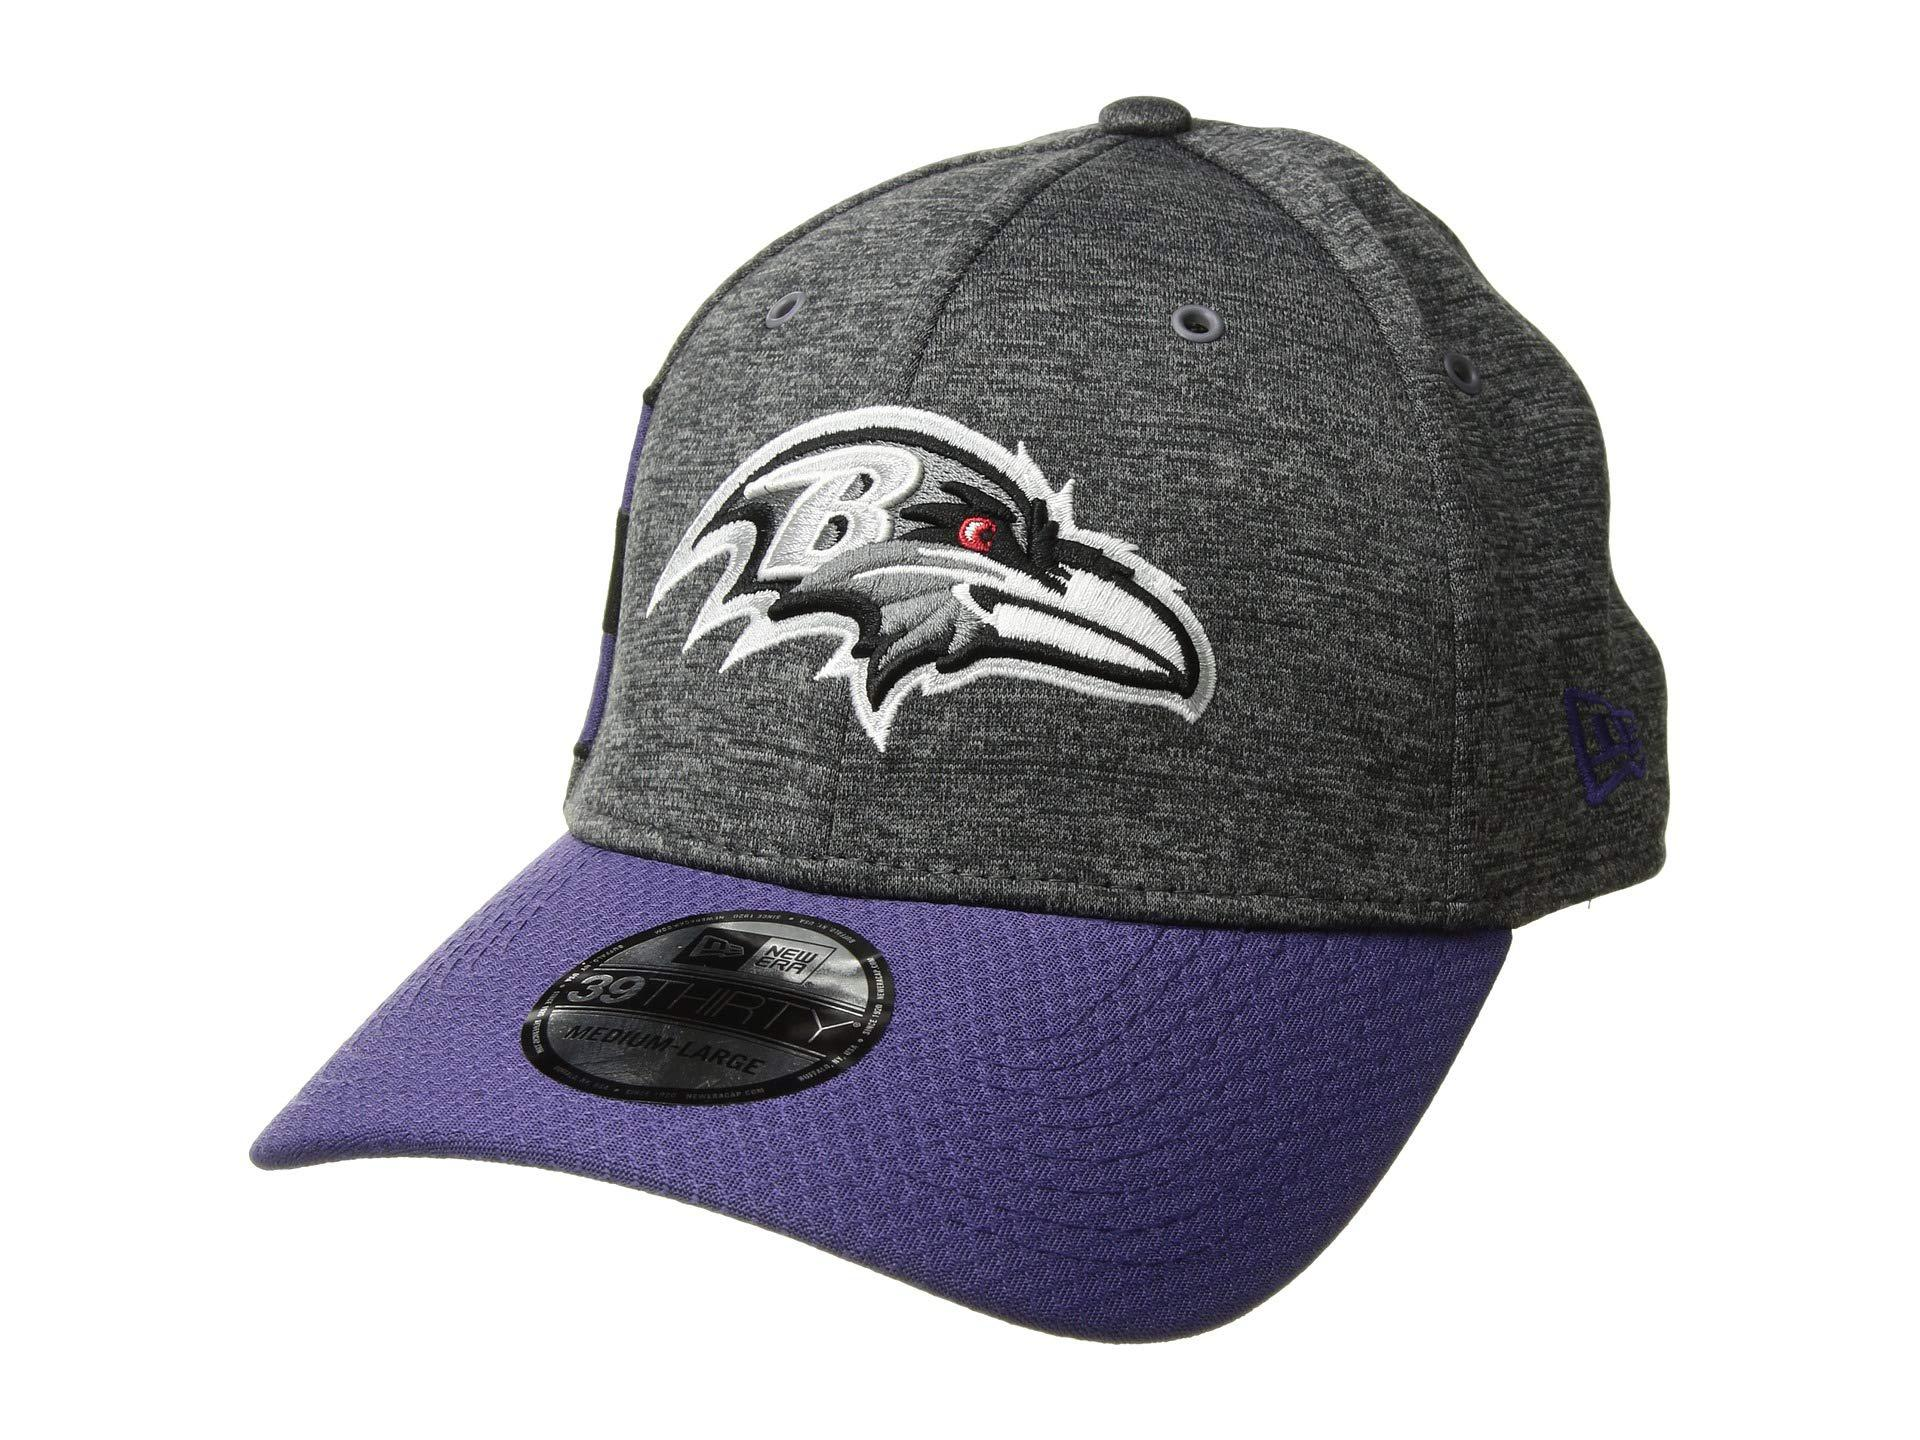 Lyst - Ktz Baltimore Ravens 3930 Home (dark Grey) Baseball Caps in ... 039c55ff9a87